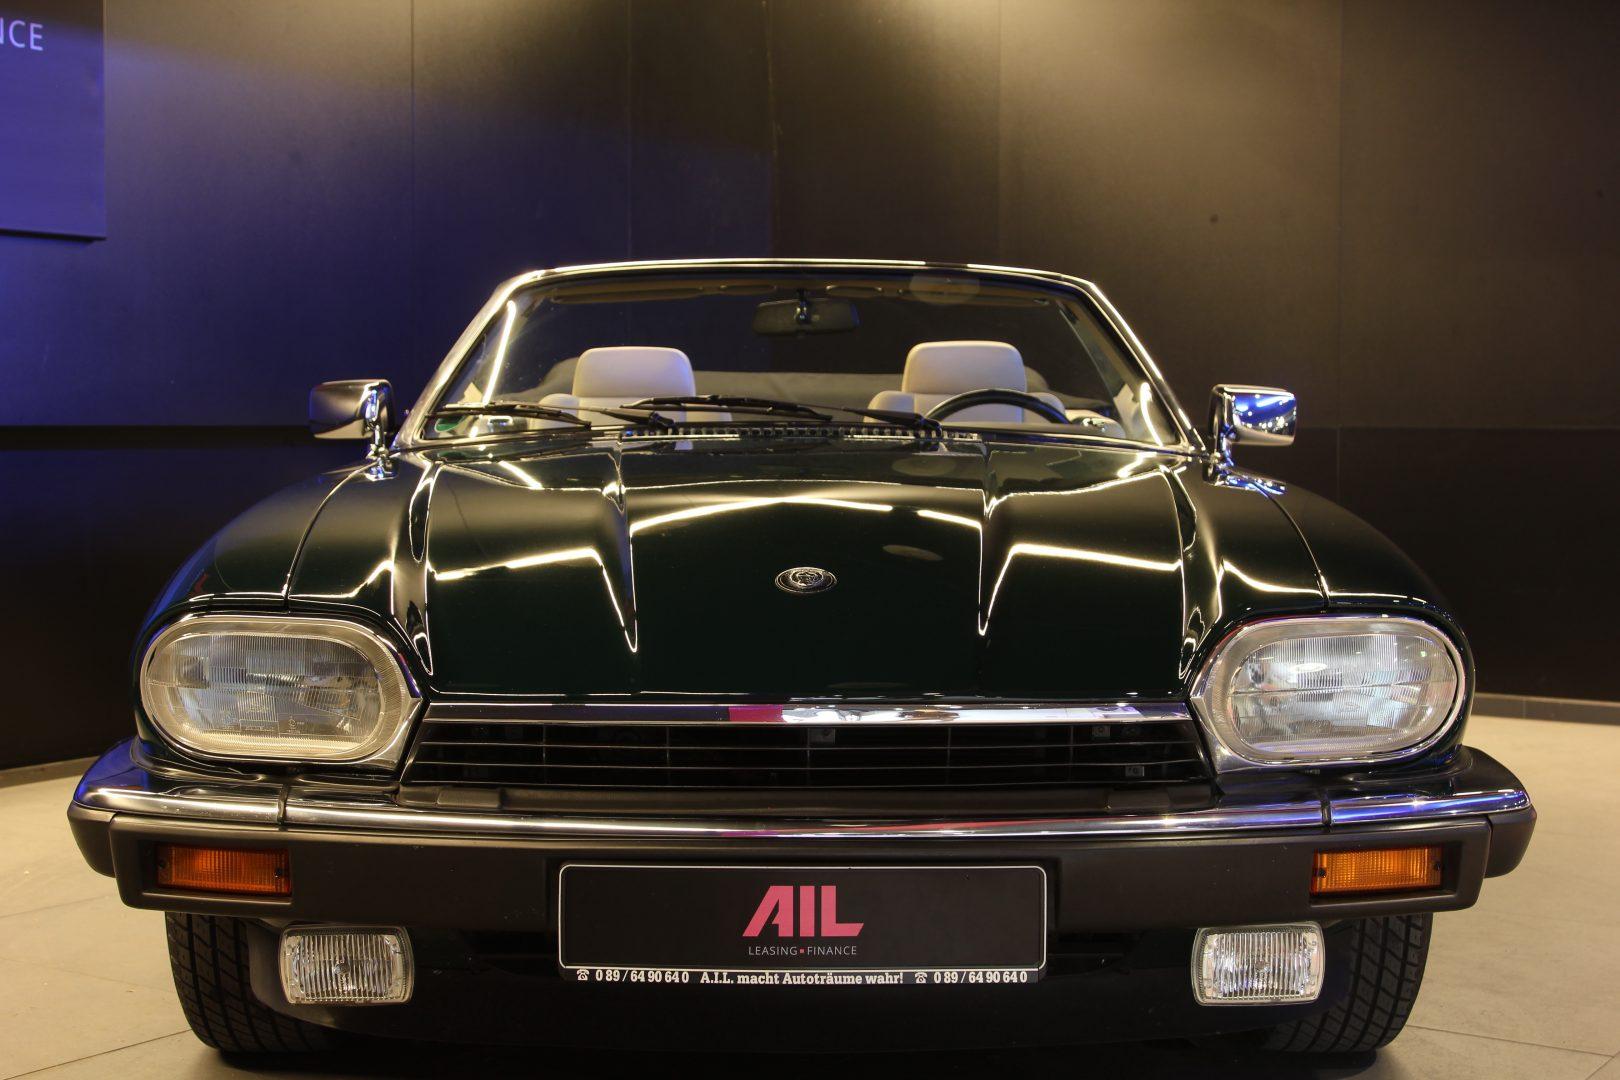 AIL Jaguar XJS 4.0 Cabriolet  8